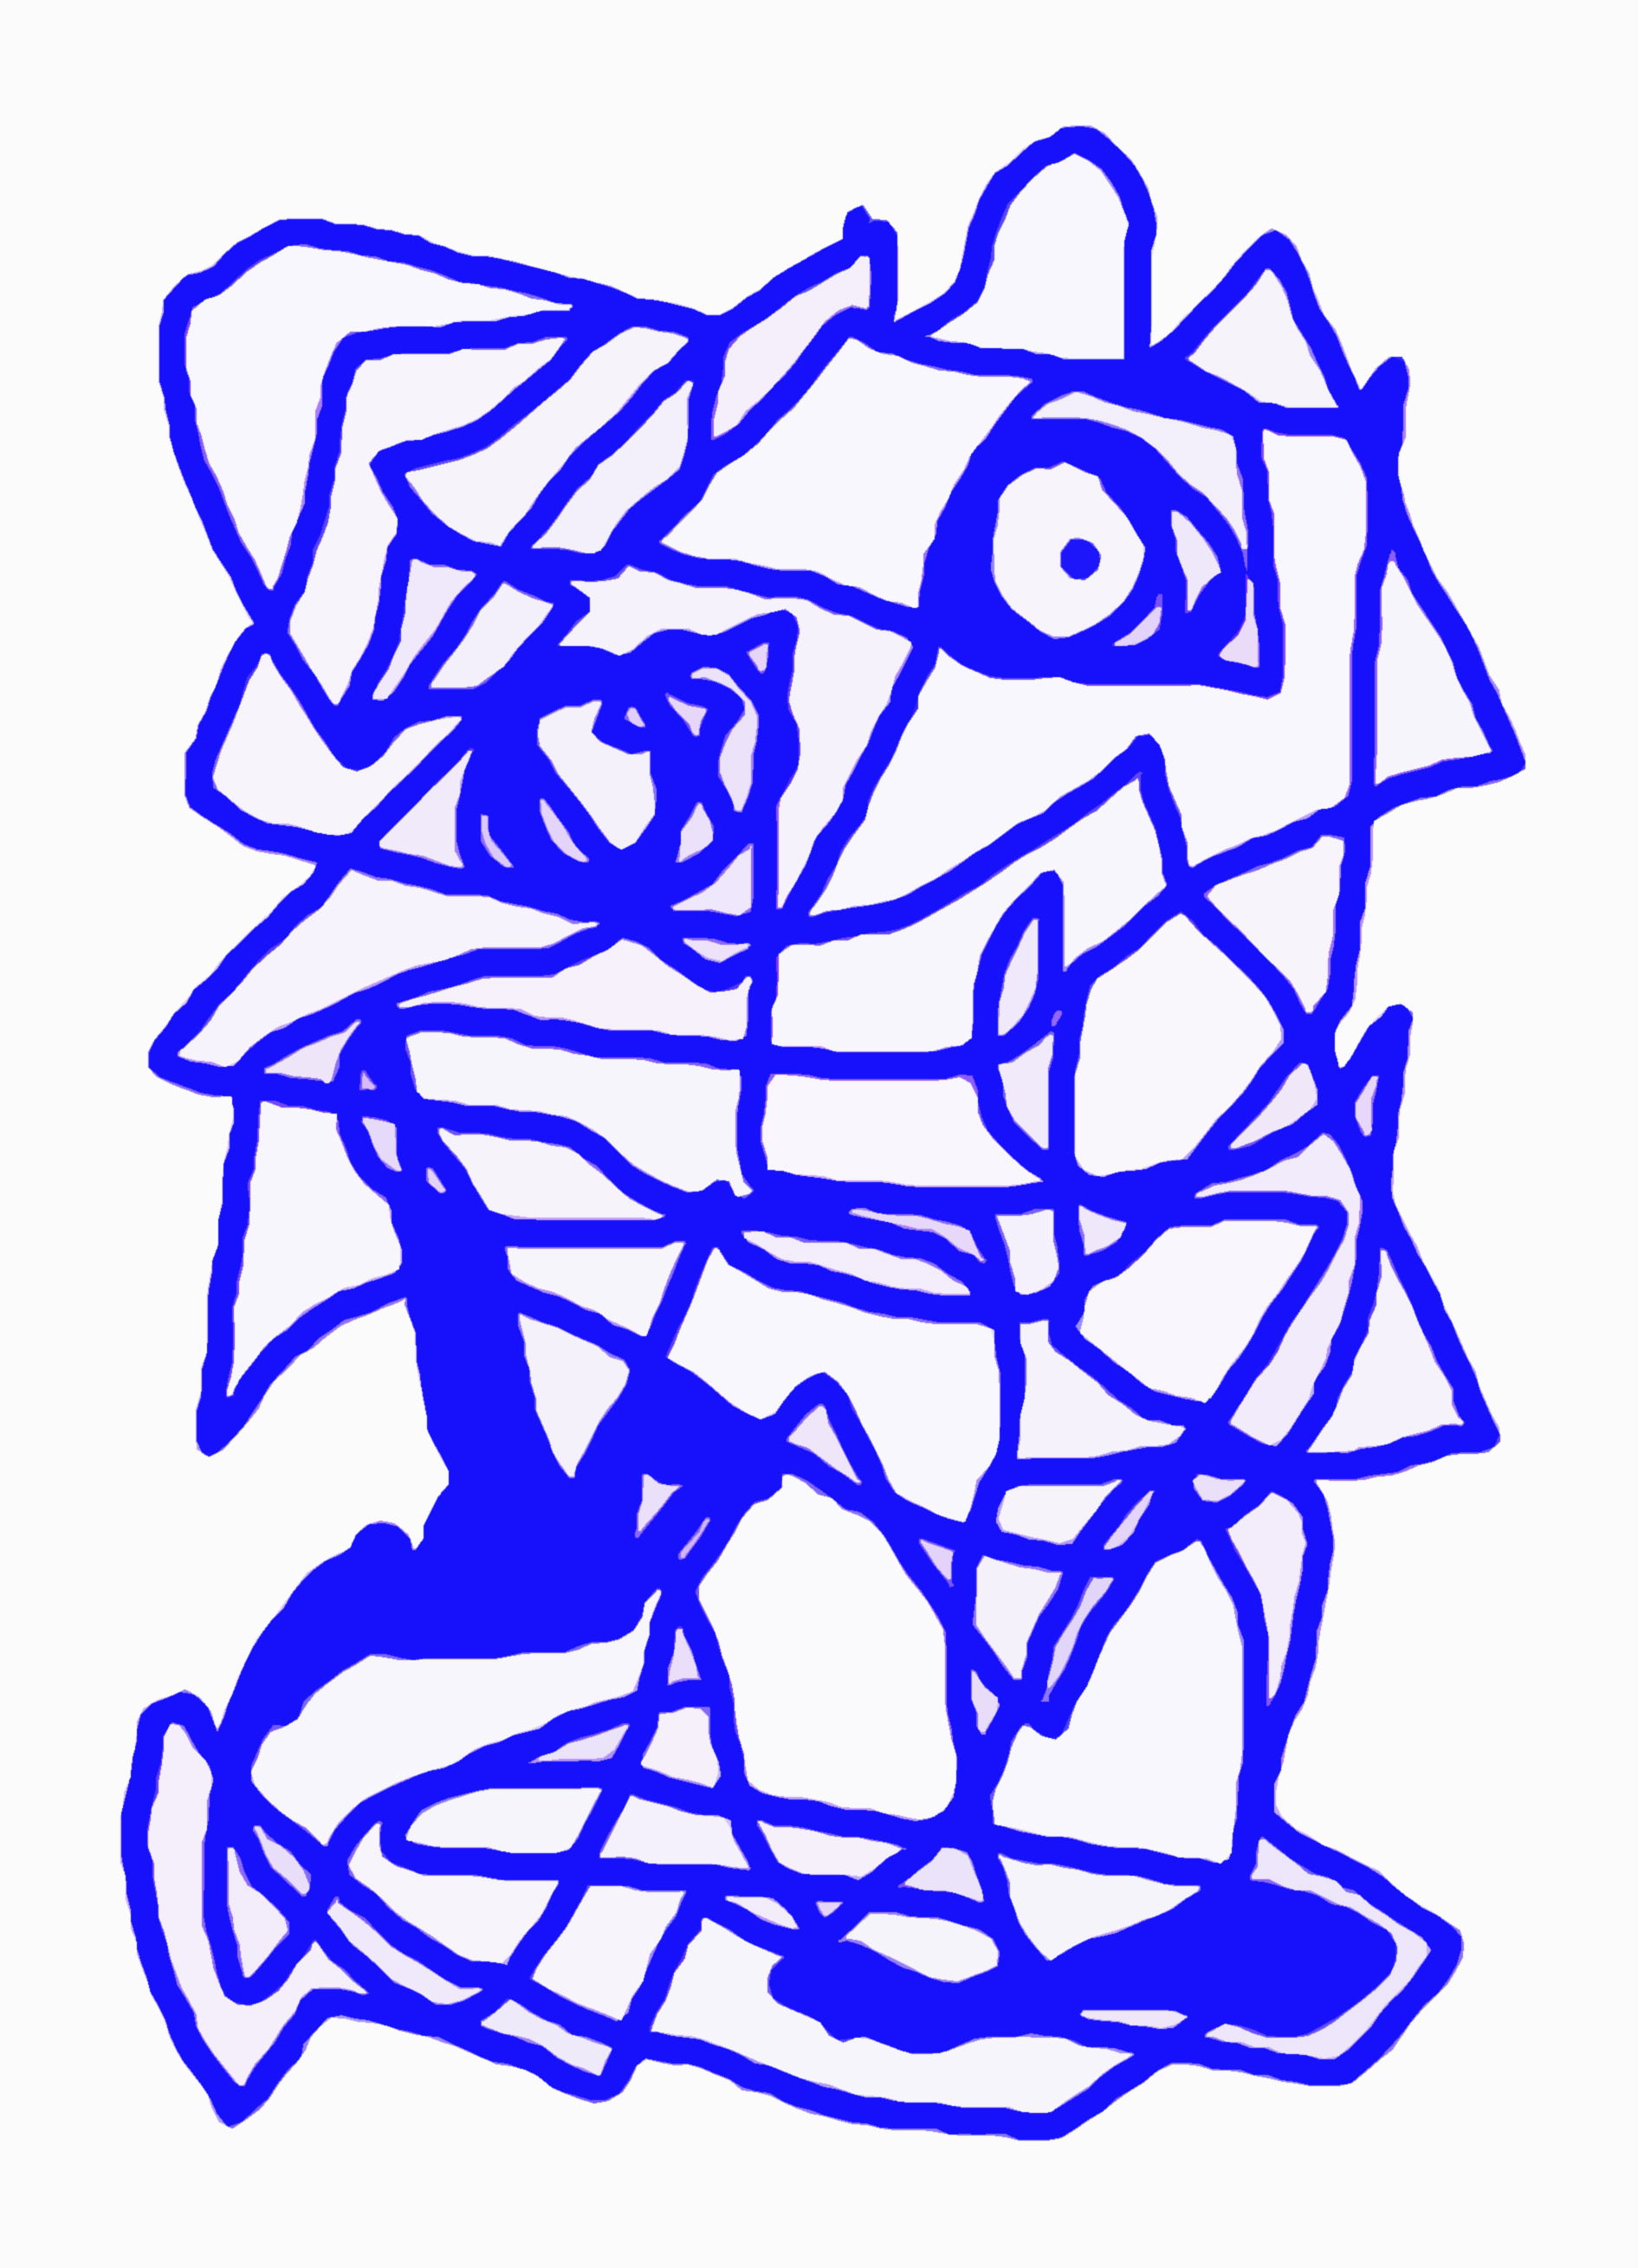 o.T. - 2004, Computergrafik